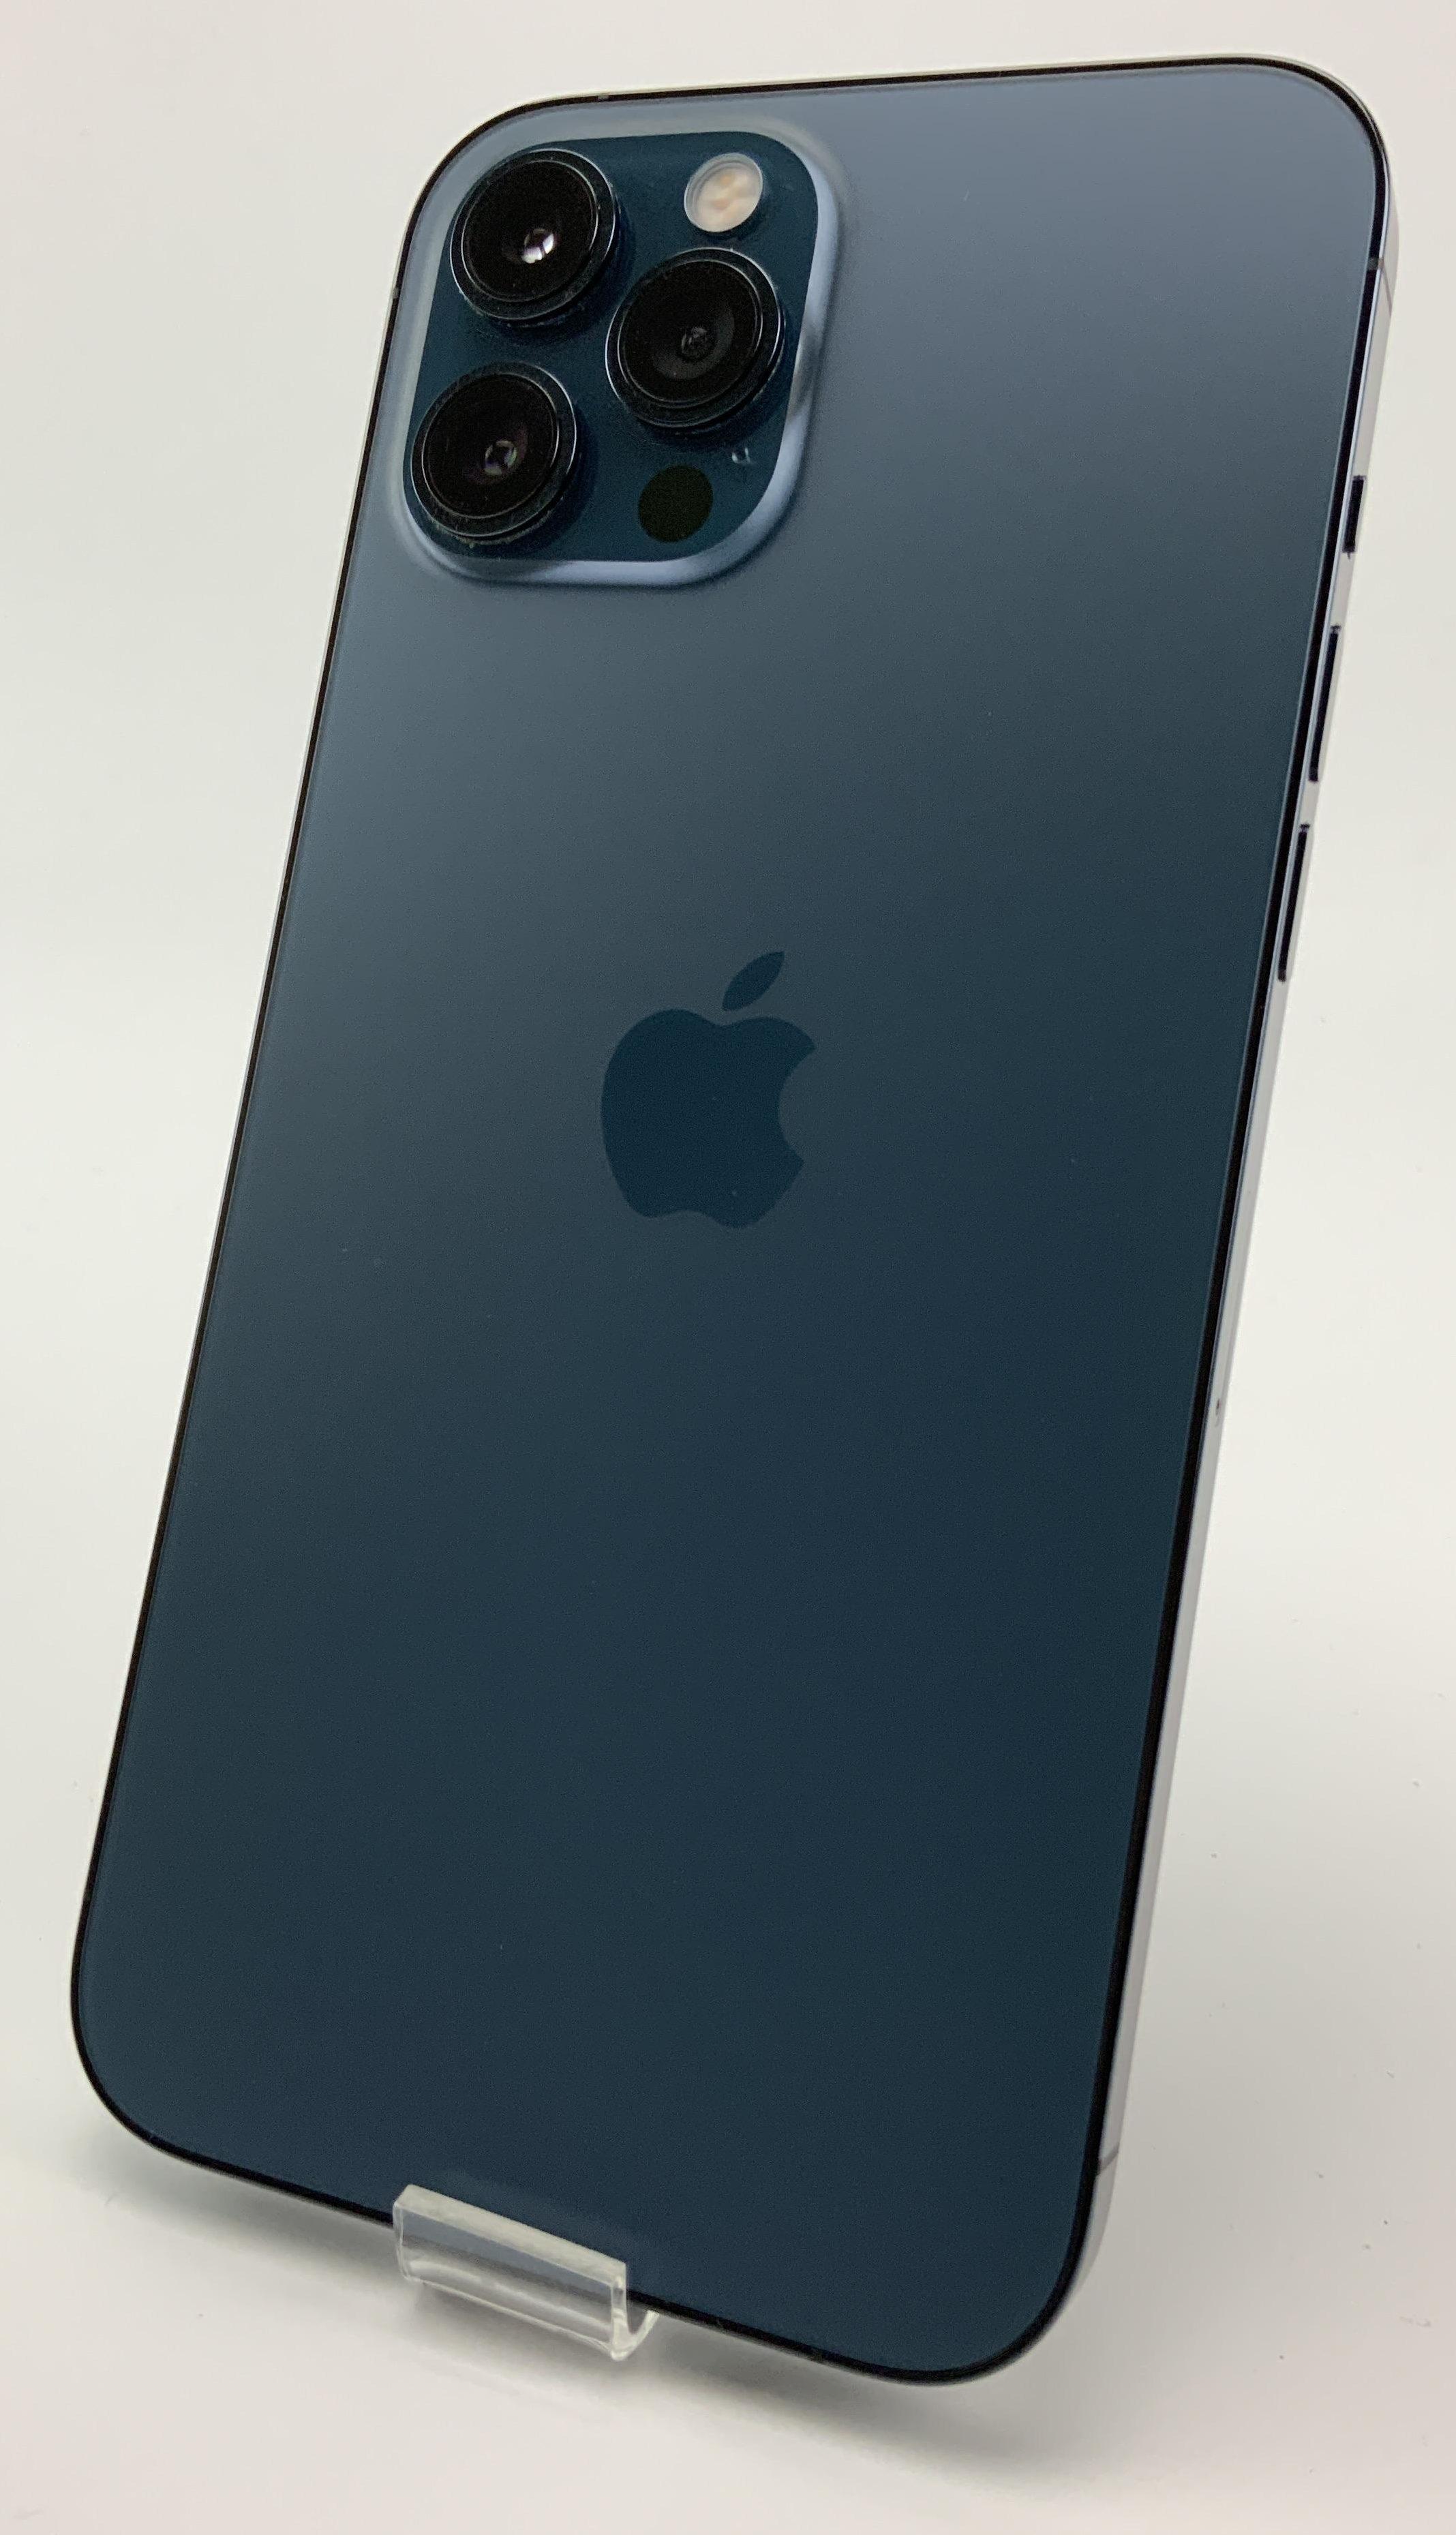 iPhone 12 Pro Max 256GB, 256GB, Pacific Blue, Afbeelding 2